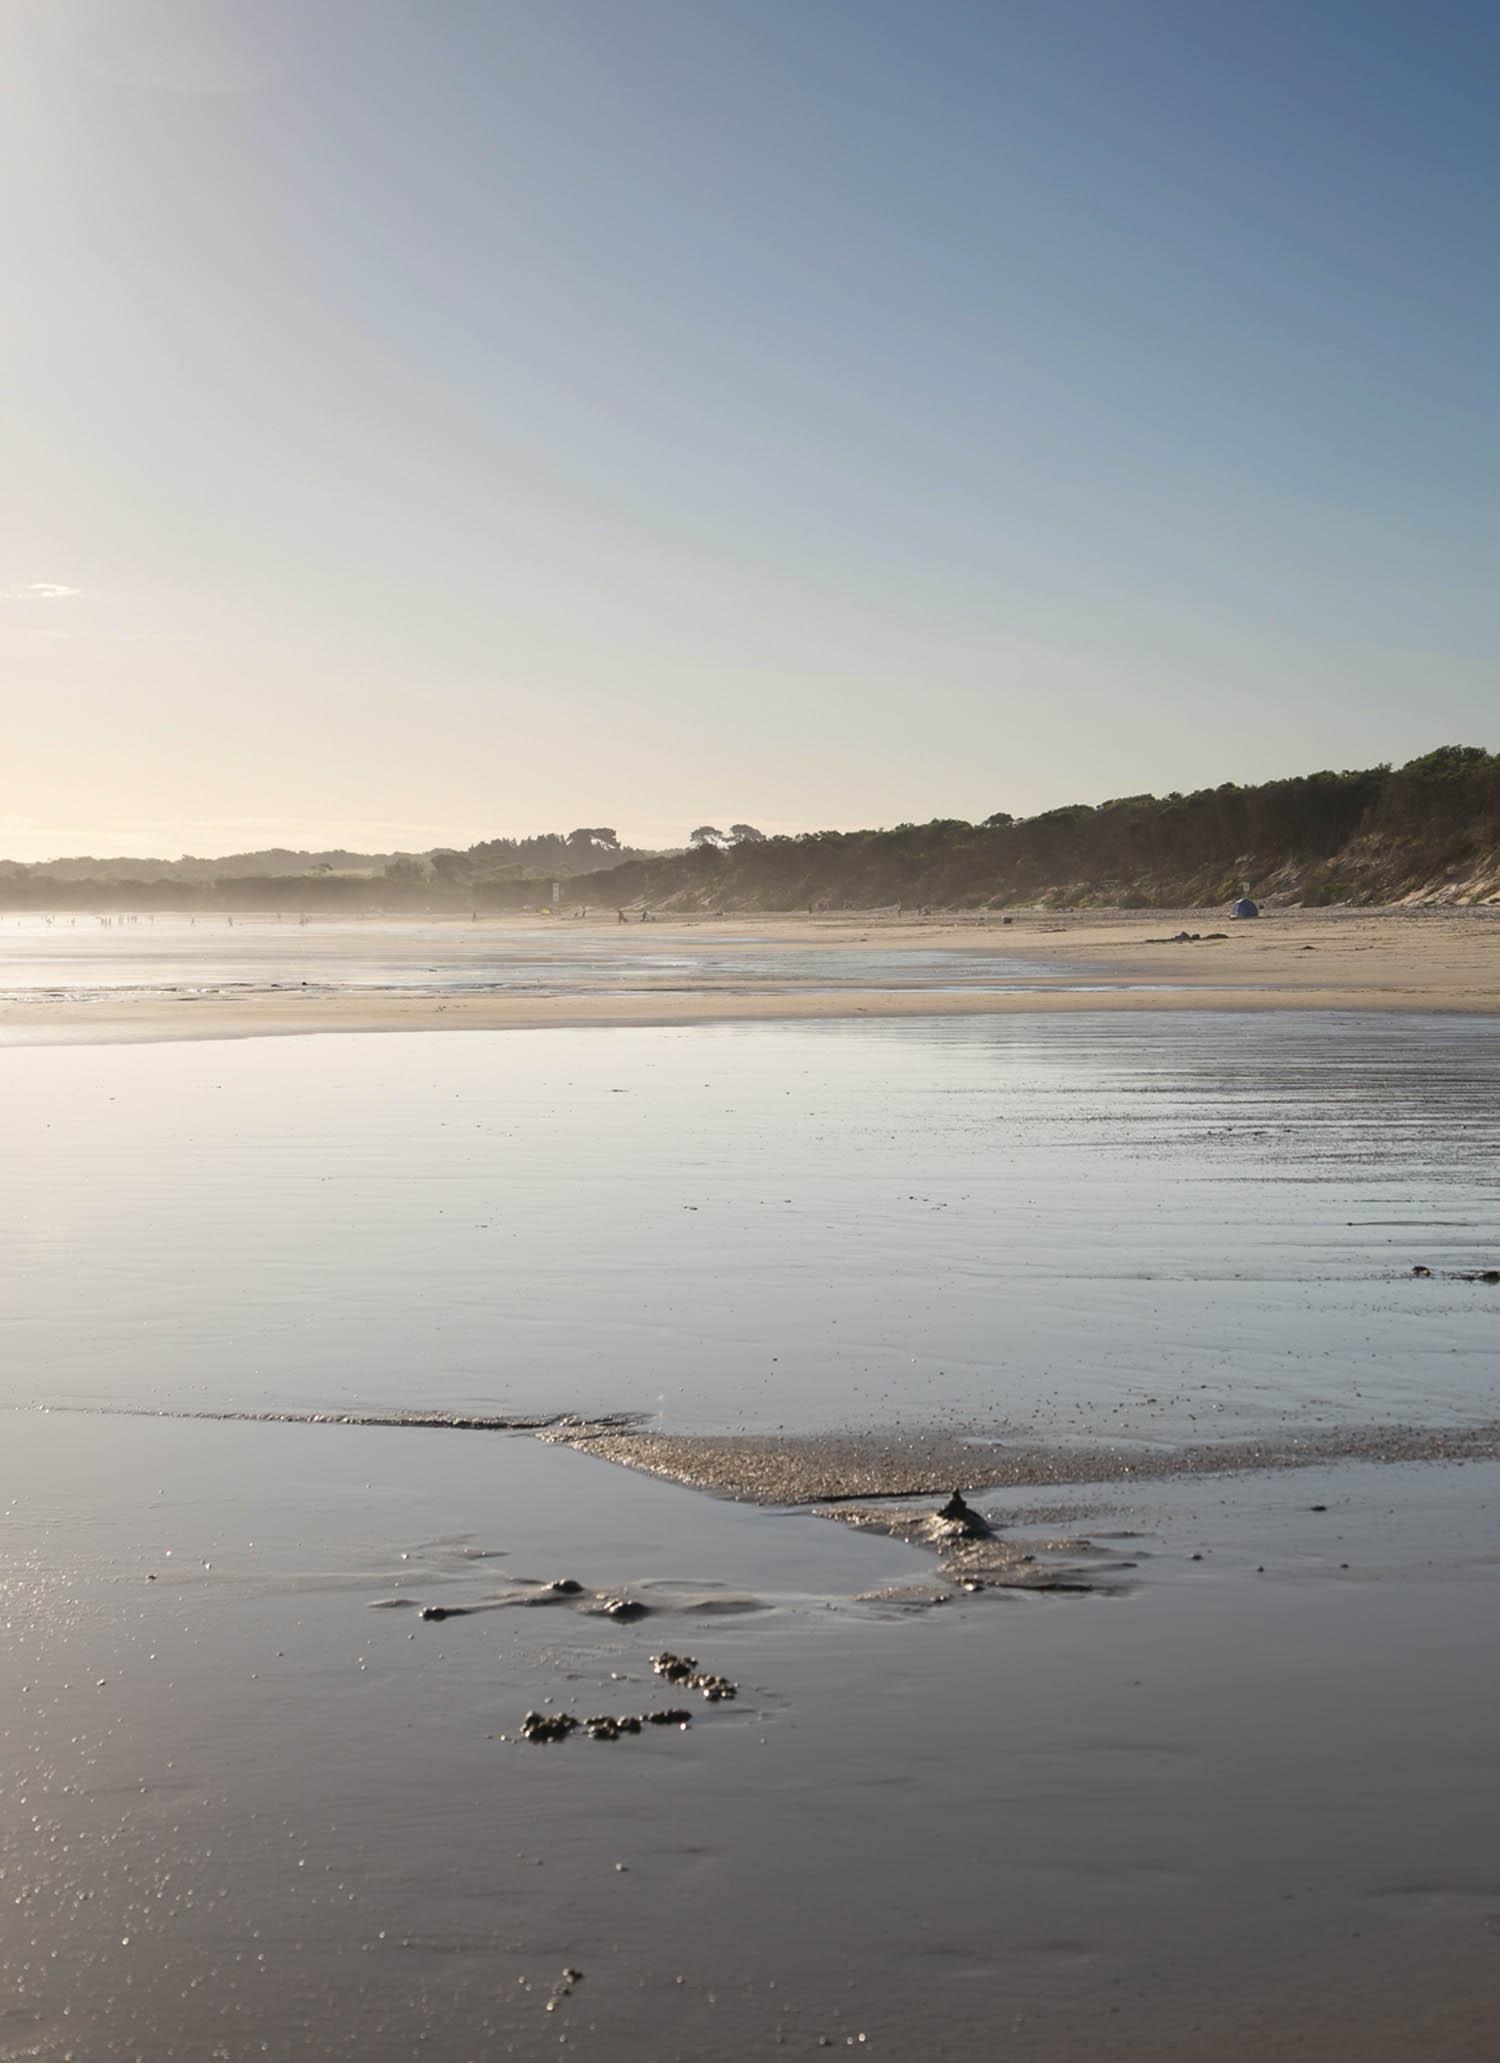 Inver loch beach Australia